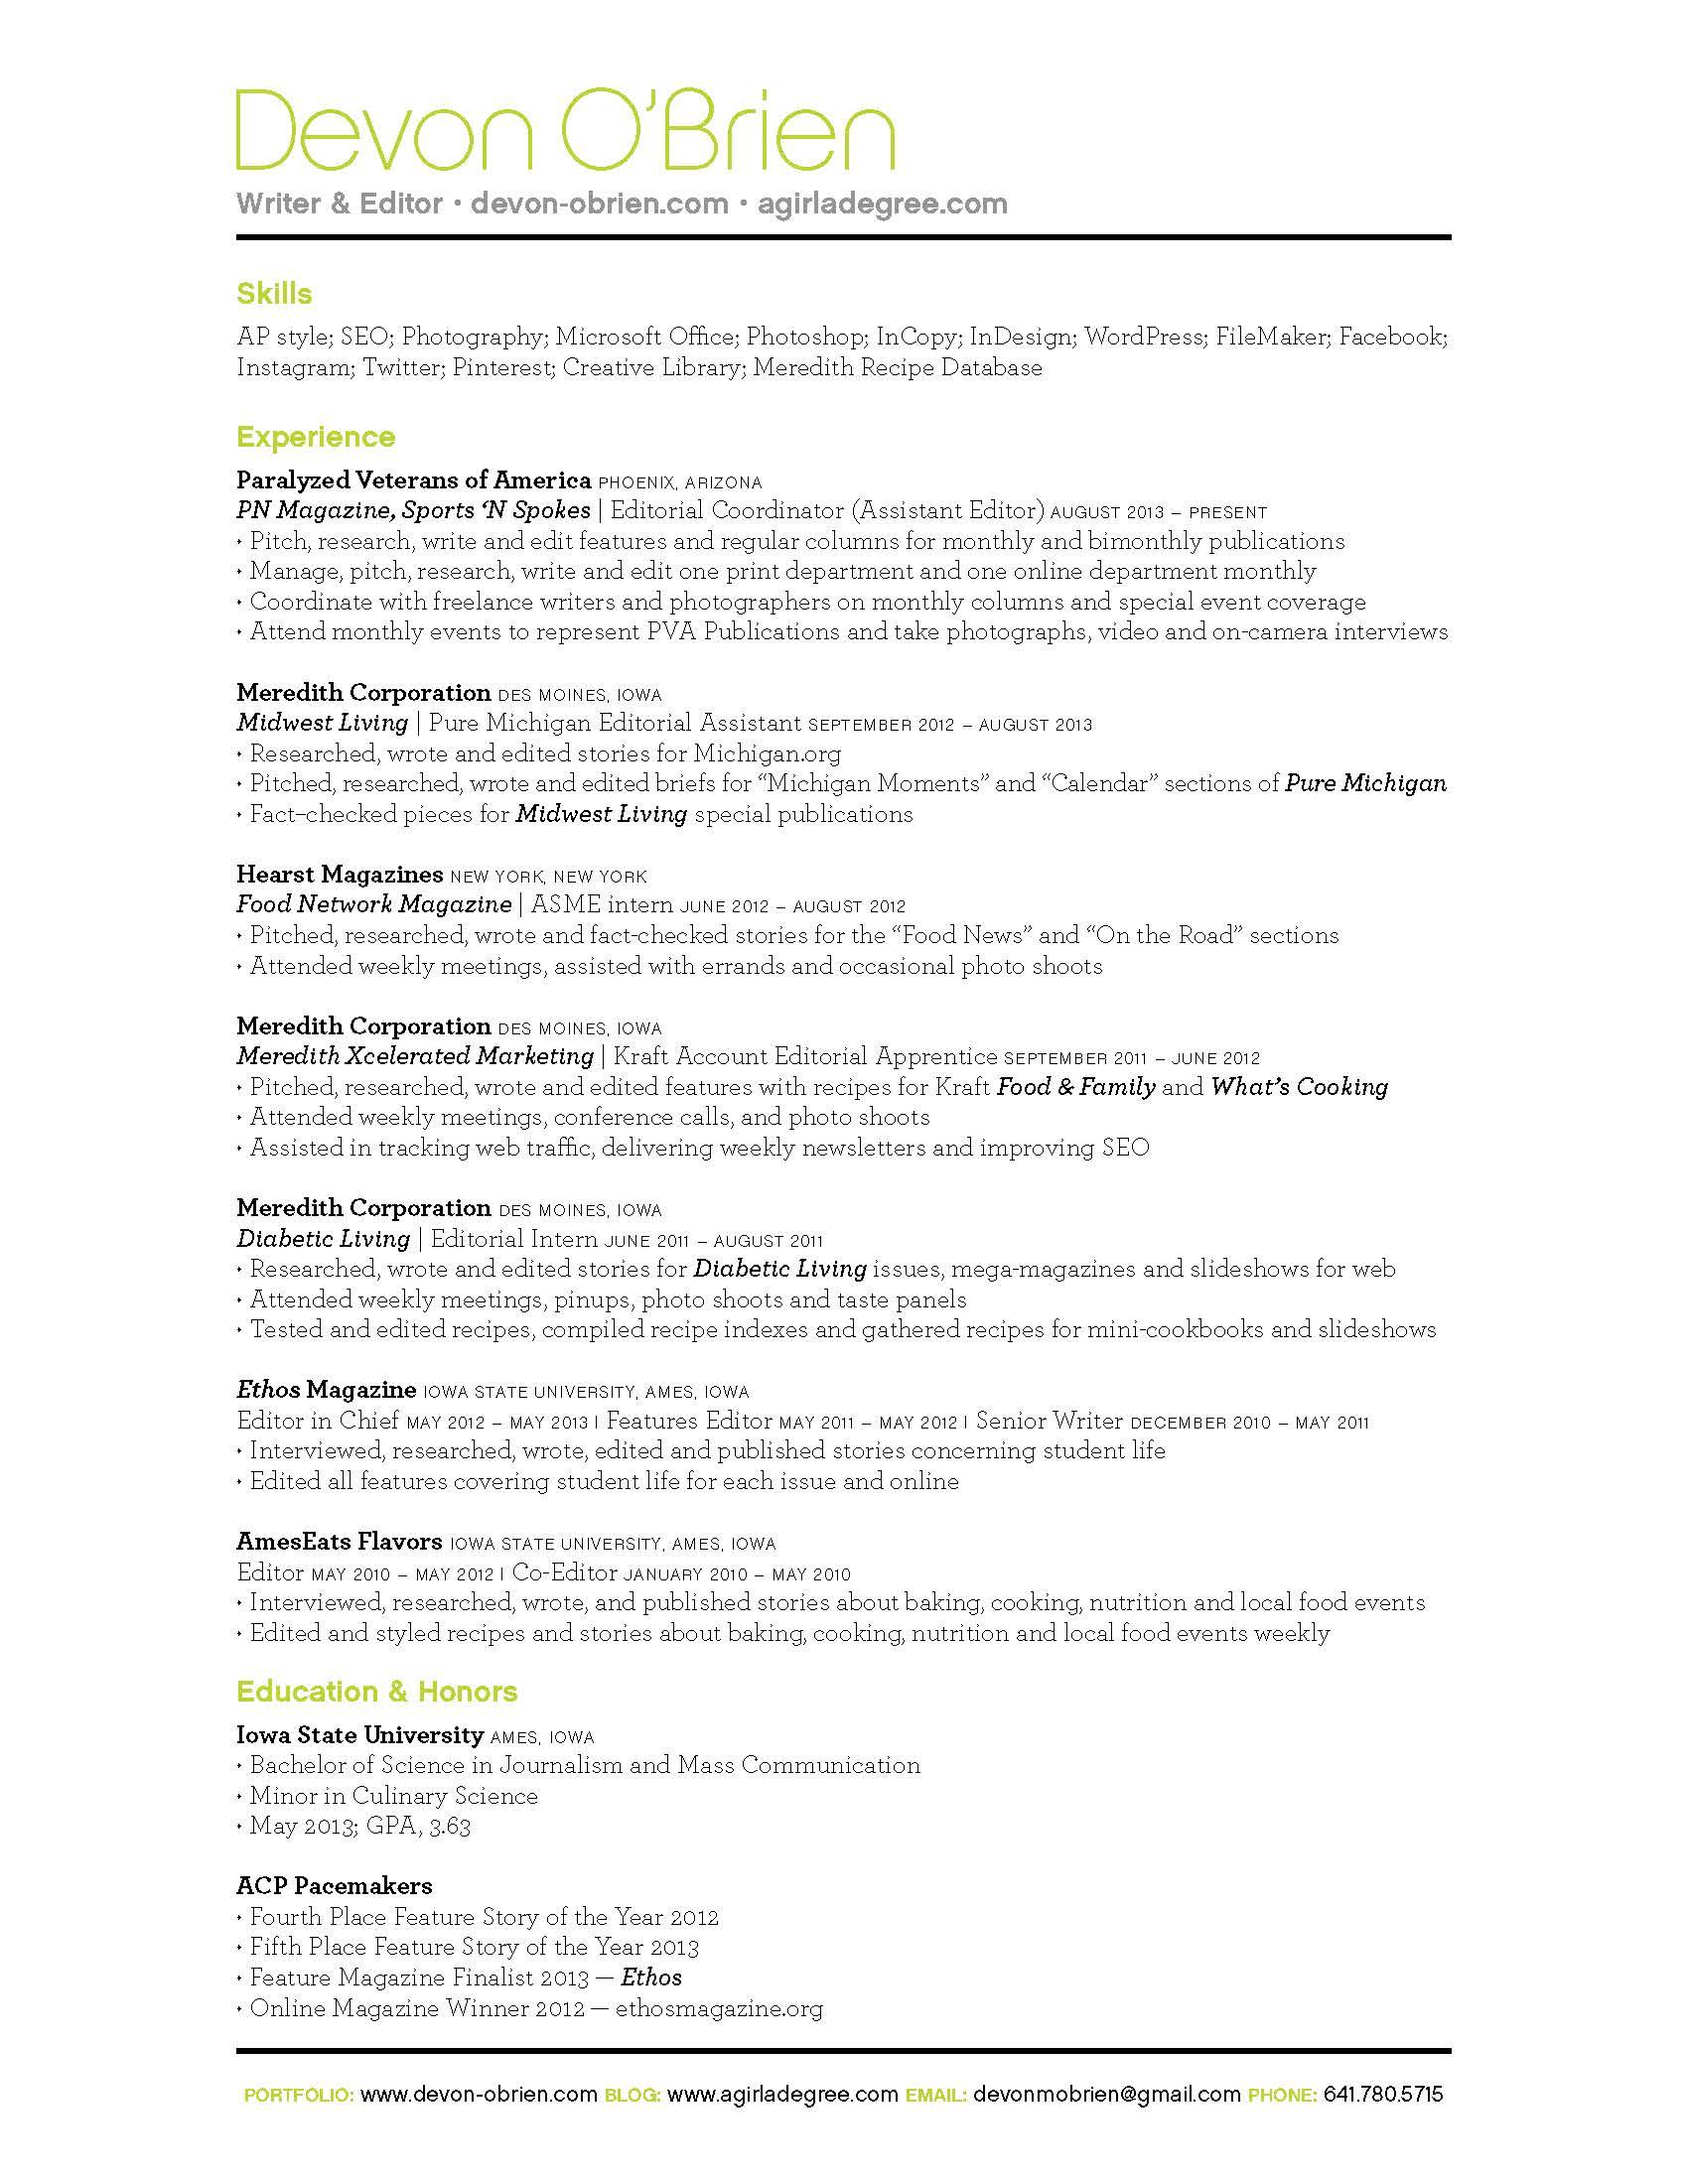 resume writing services des moines iowa